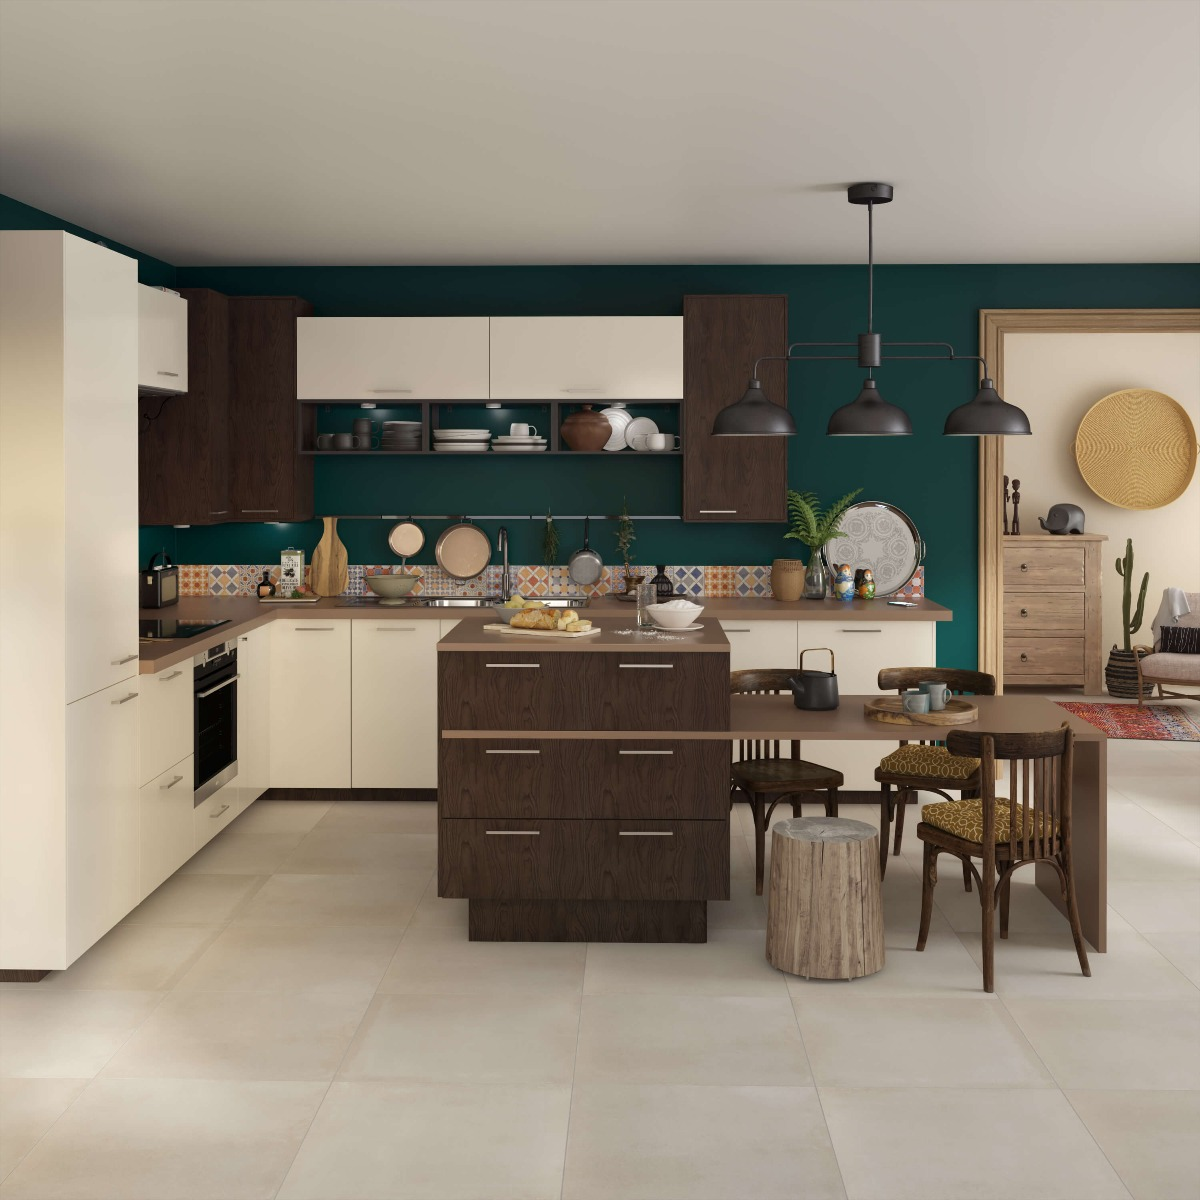 Delinia Sevilla Ivory Designer Kitchen Mobi - Example 2